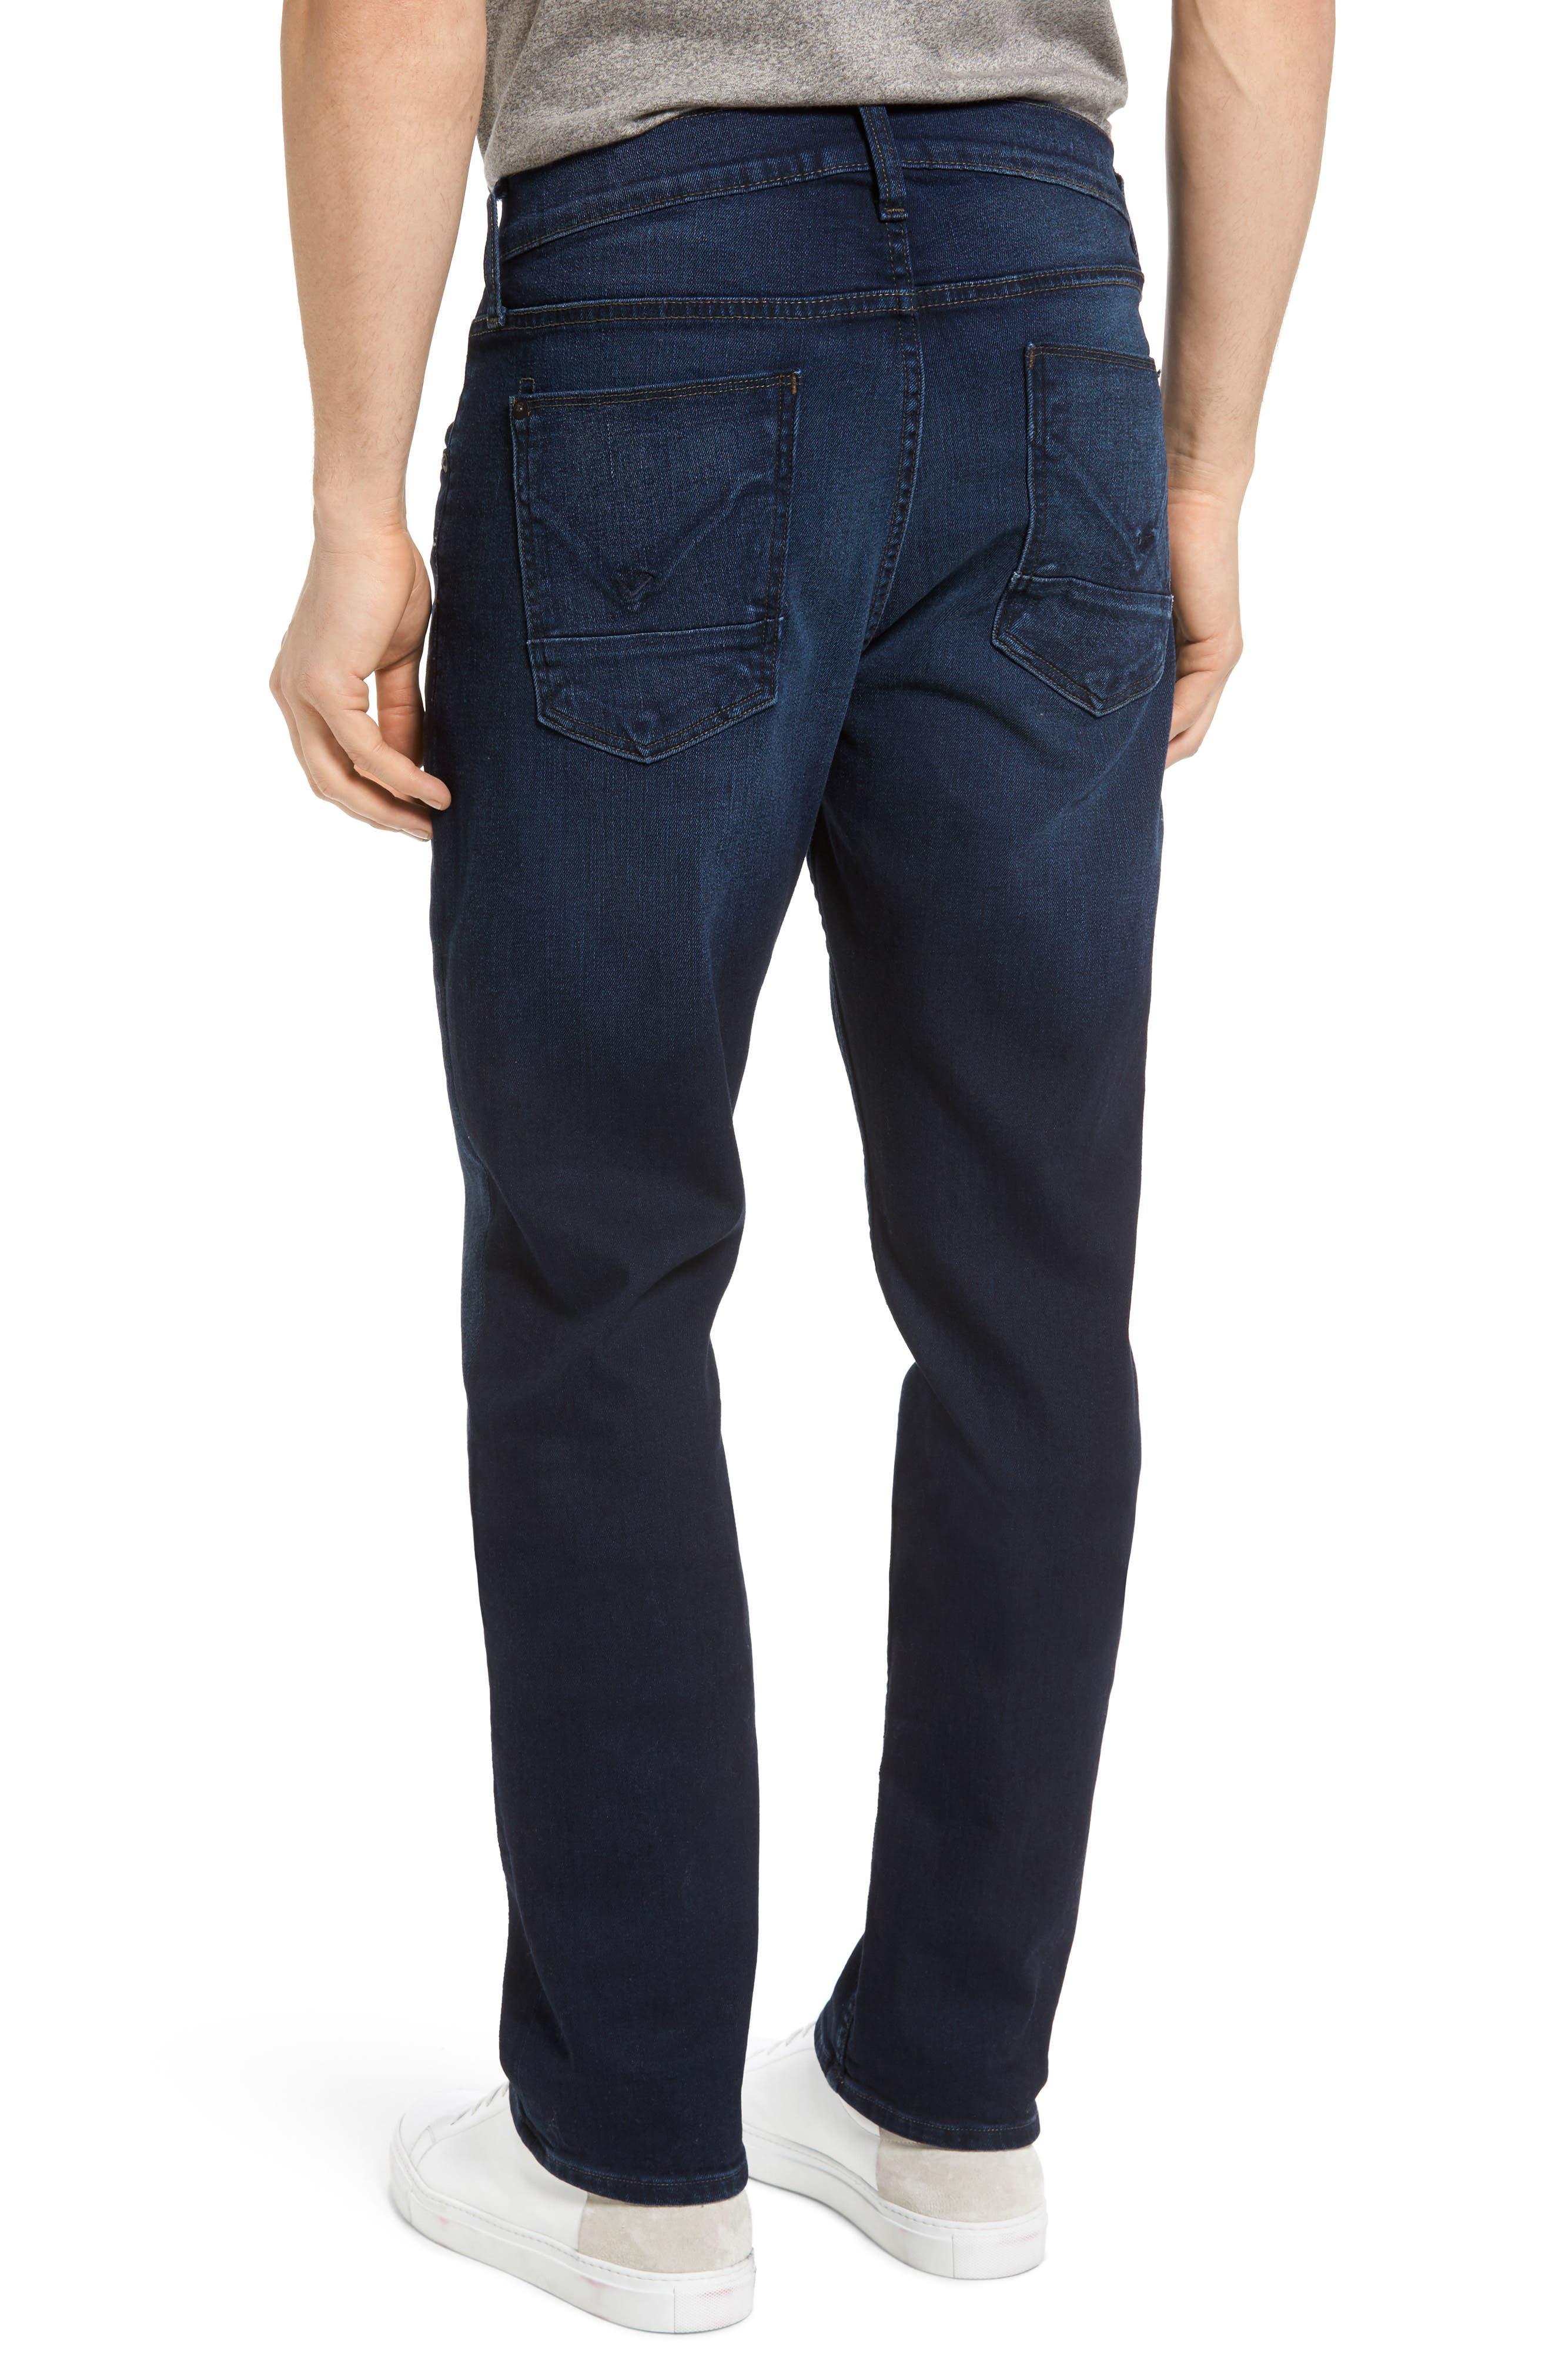 Byron Slim Straight Leg Jeans,                             Alternate thumbnail 2, color,                             401